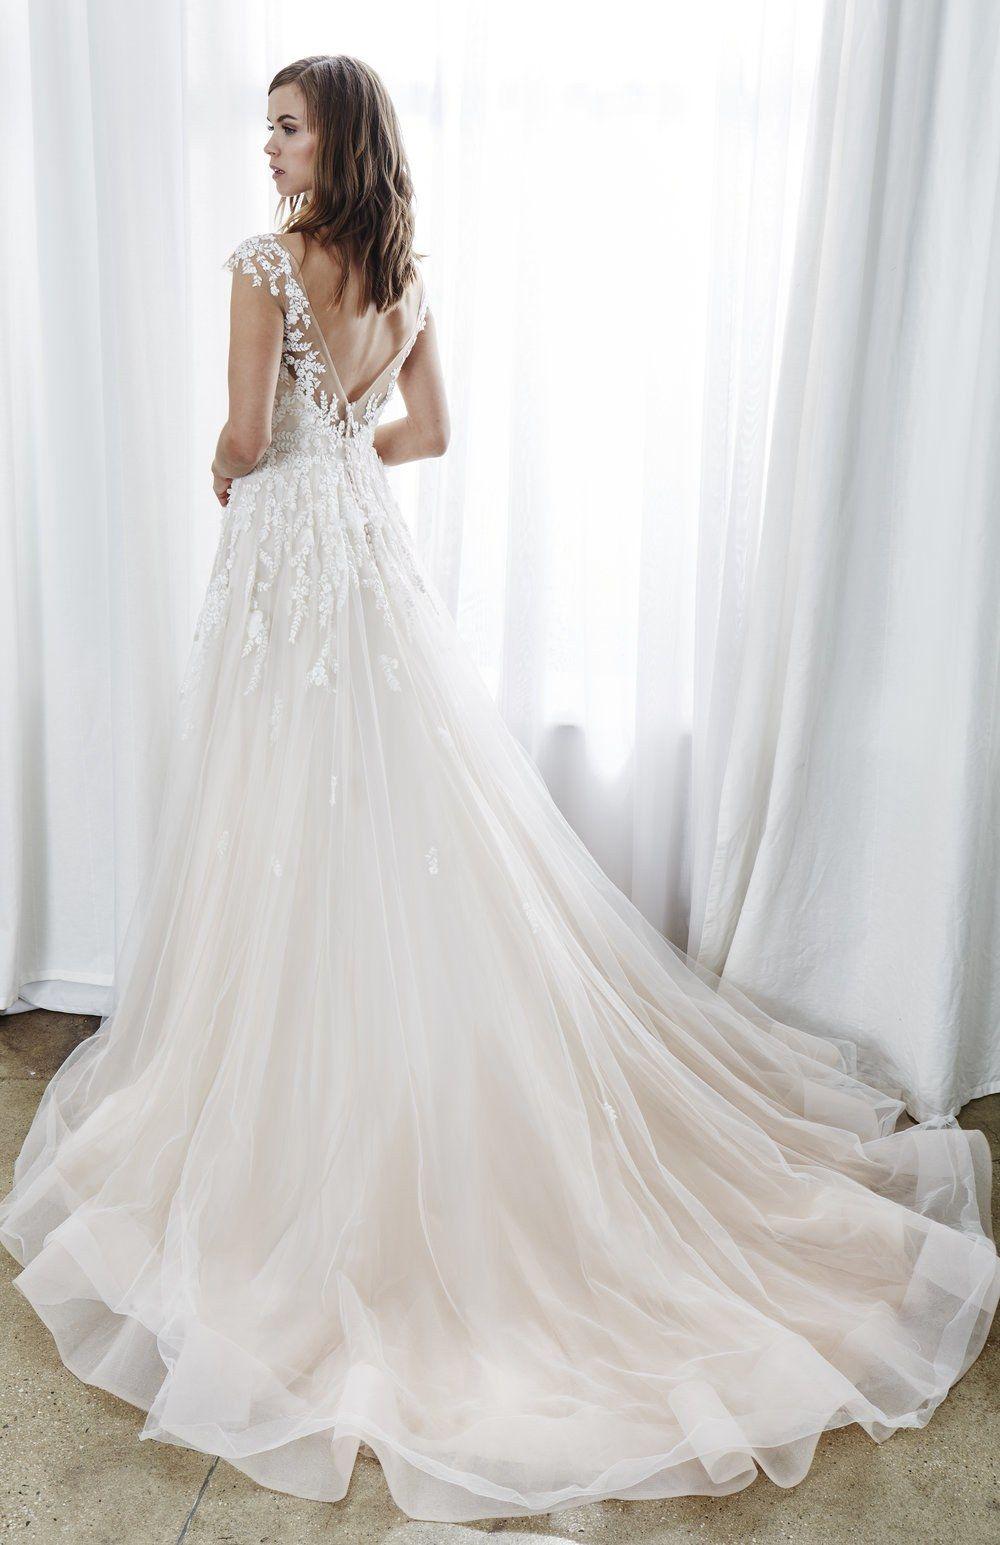 Cream dresses for weddings  Princess Eugenieus Wedding Dress Will Look Like This According to